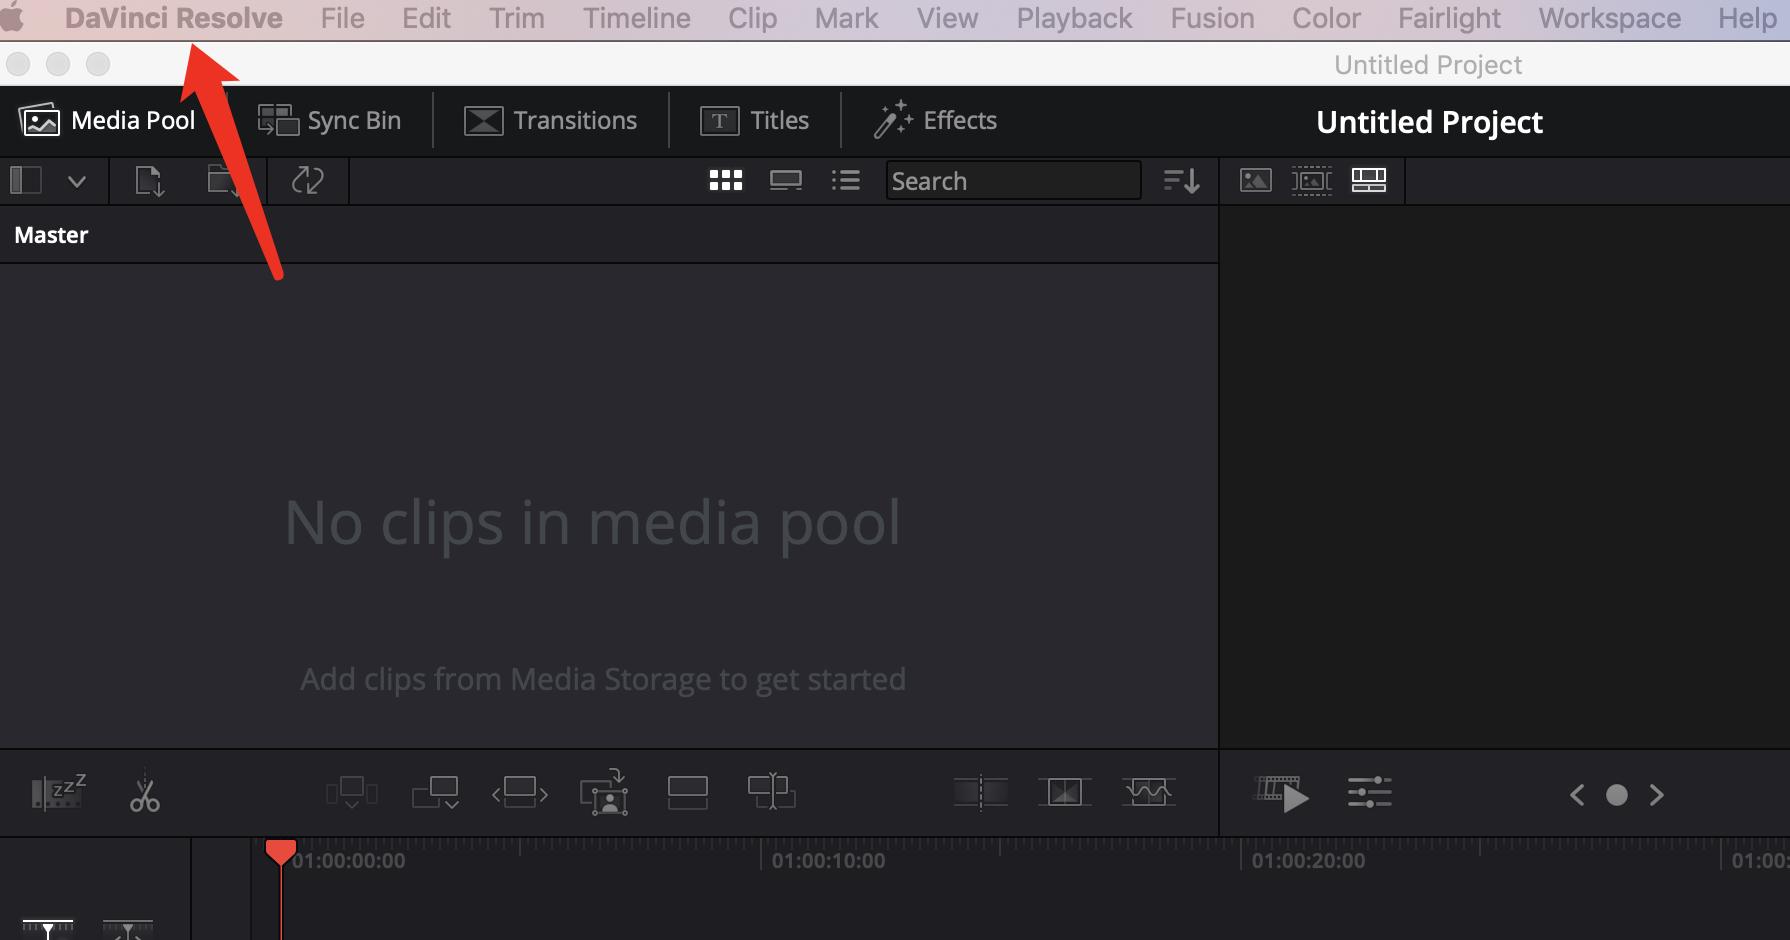 DaVinci Resolve Studio 达芬奇 16.2中文破解版 Mac顶级调色软件-马克喵